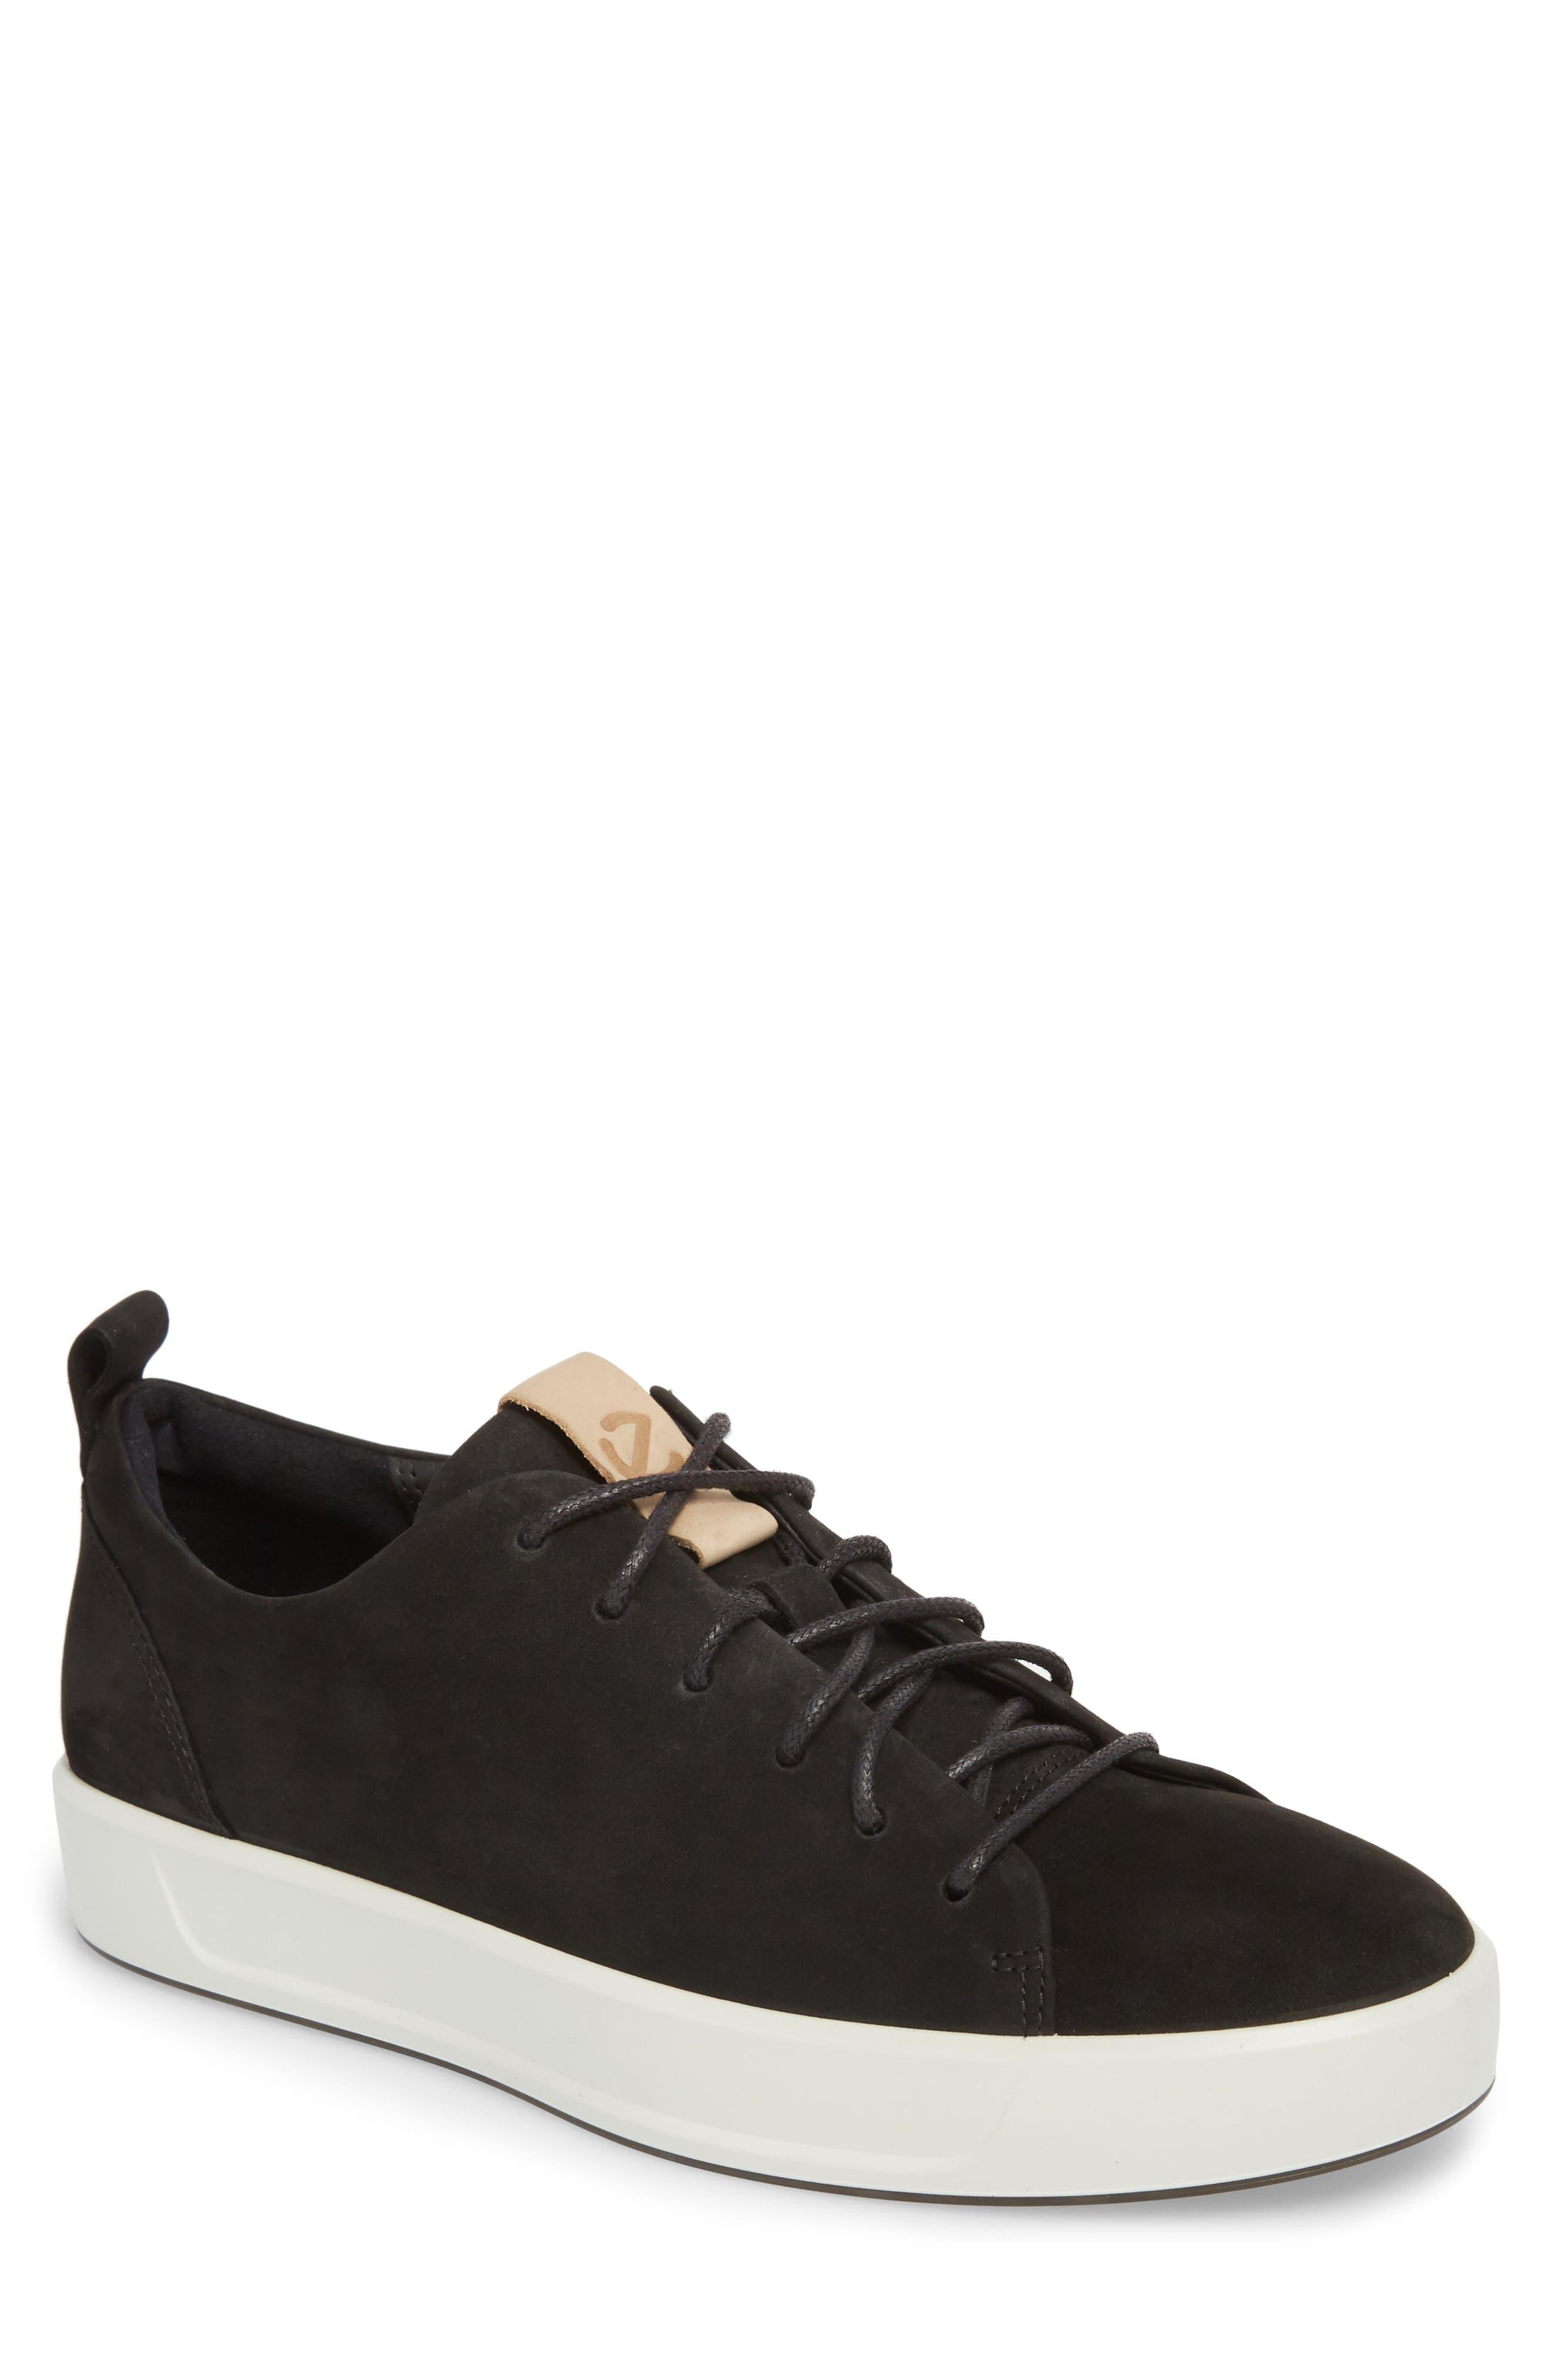 Soft 8 Sneaker,                             Main thumbnail 1, color,                             BLACK POWDER LEATHER